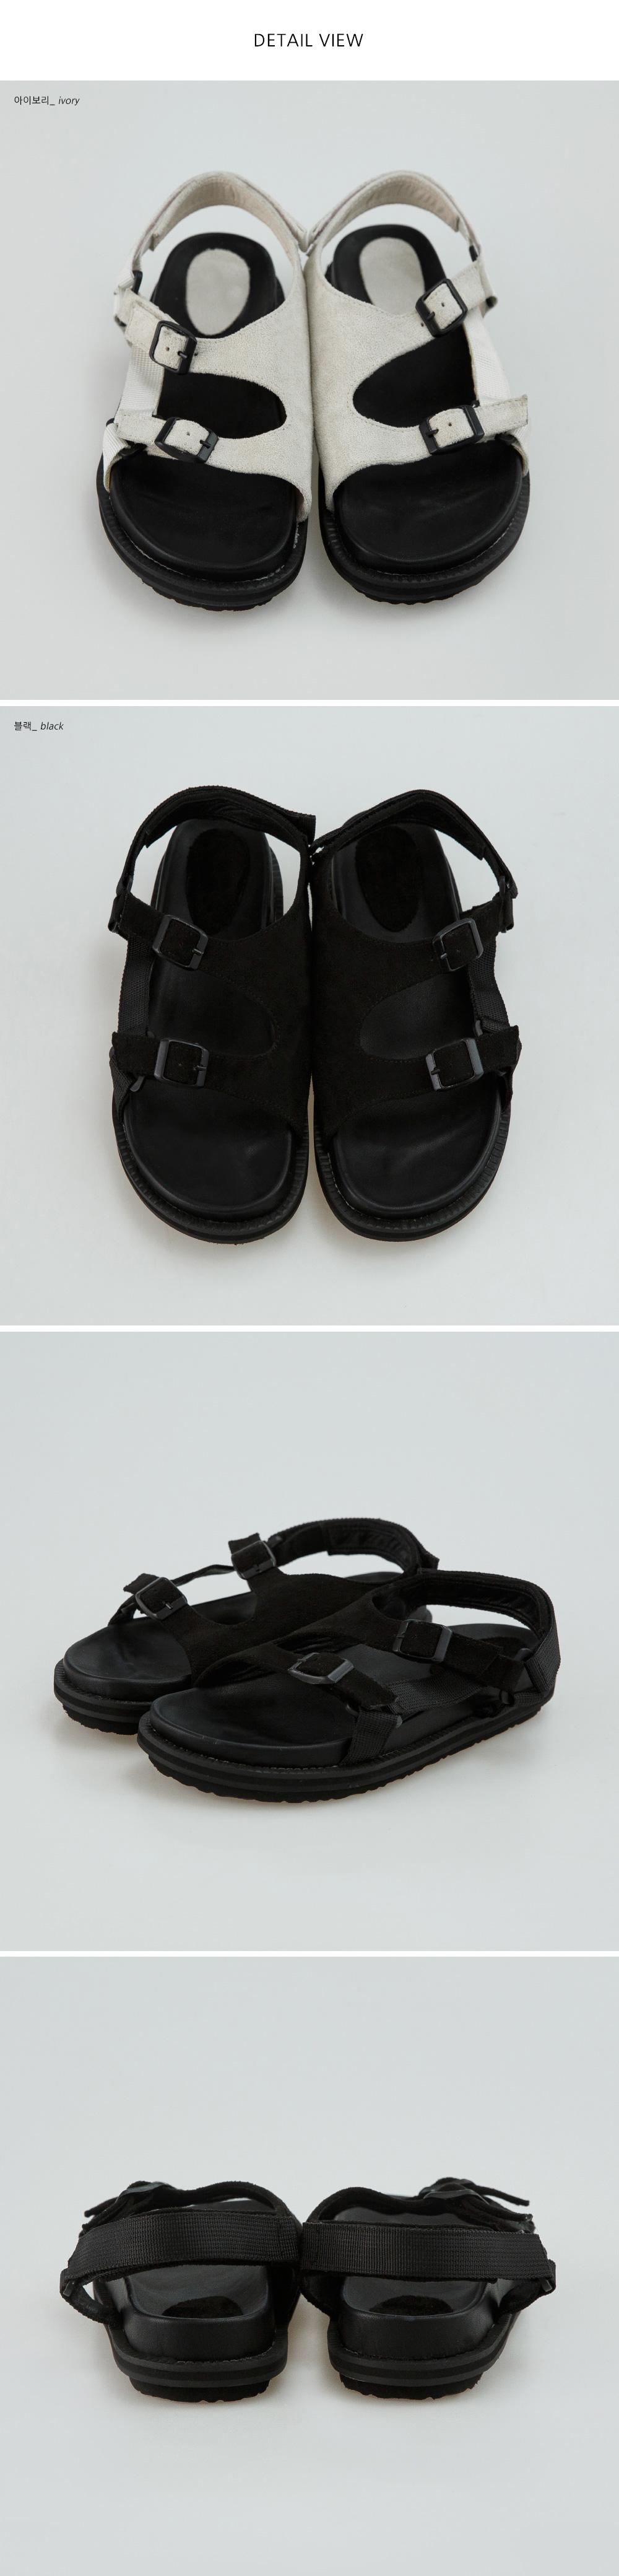 casual 2 buckle sandal